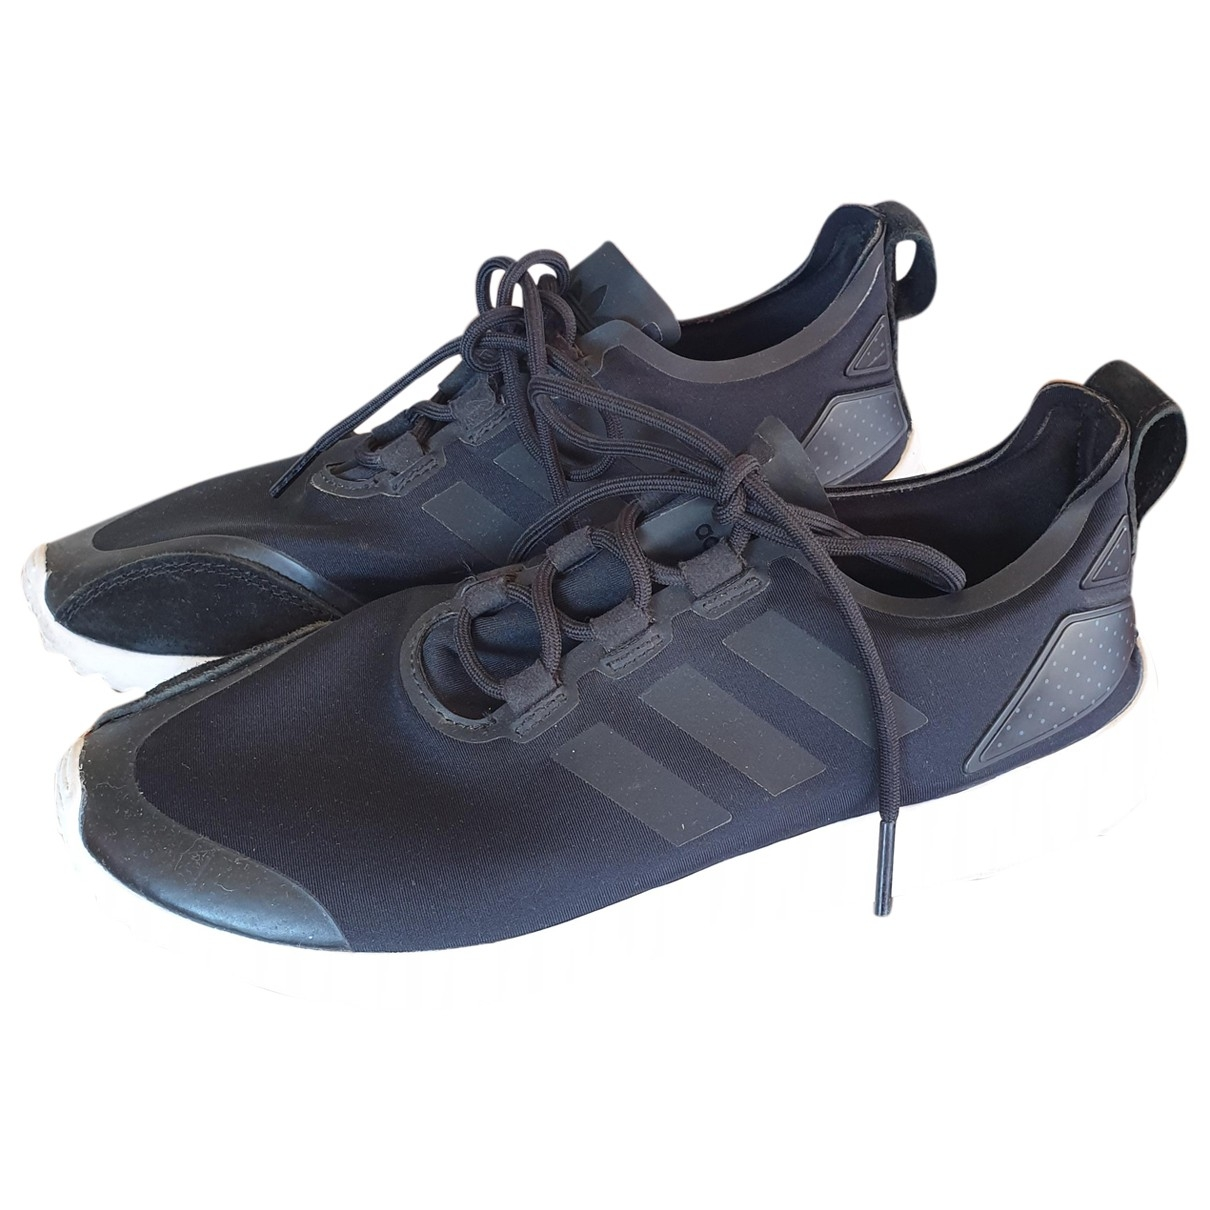 Adidas ZX Sneakers in  Schwarz Leinen